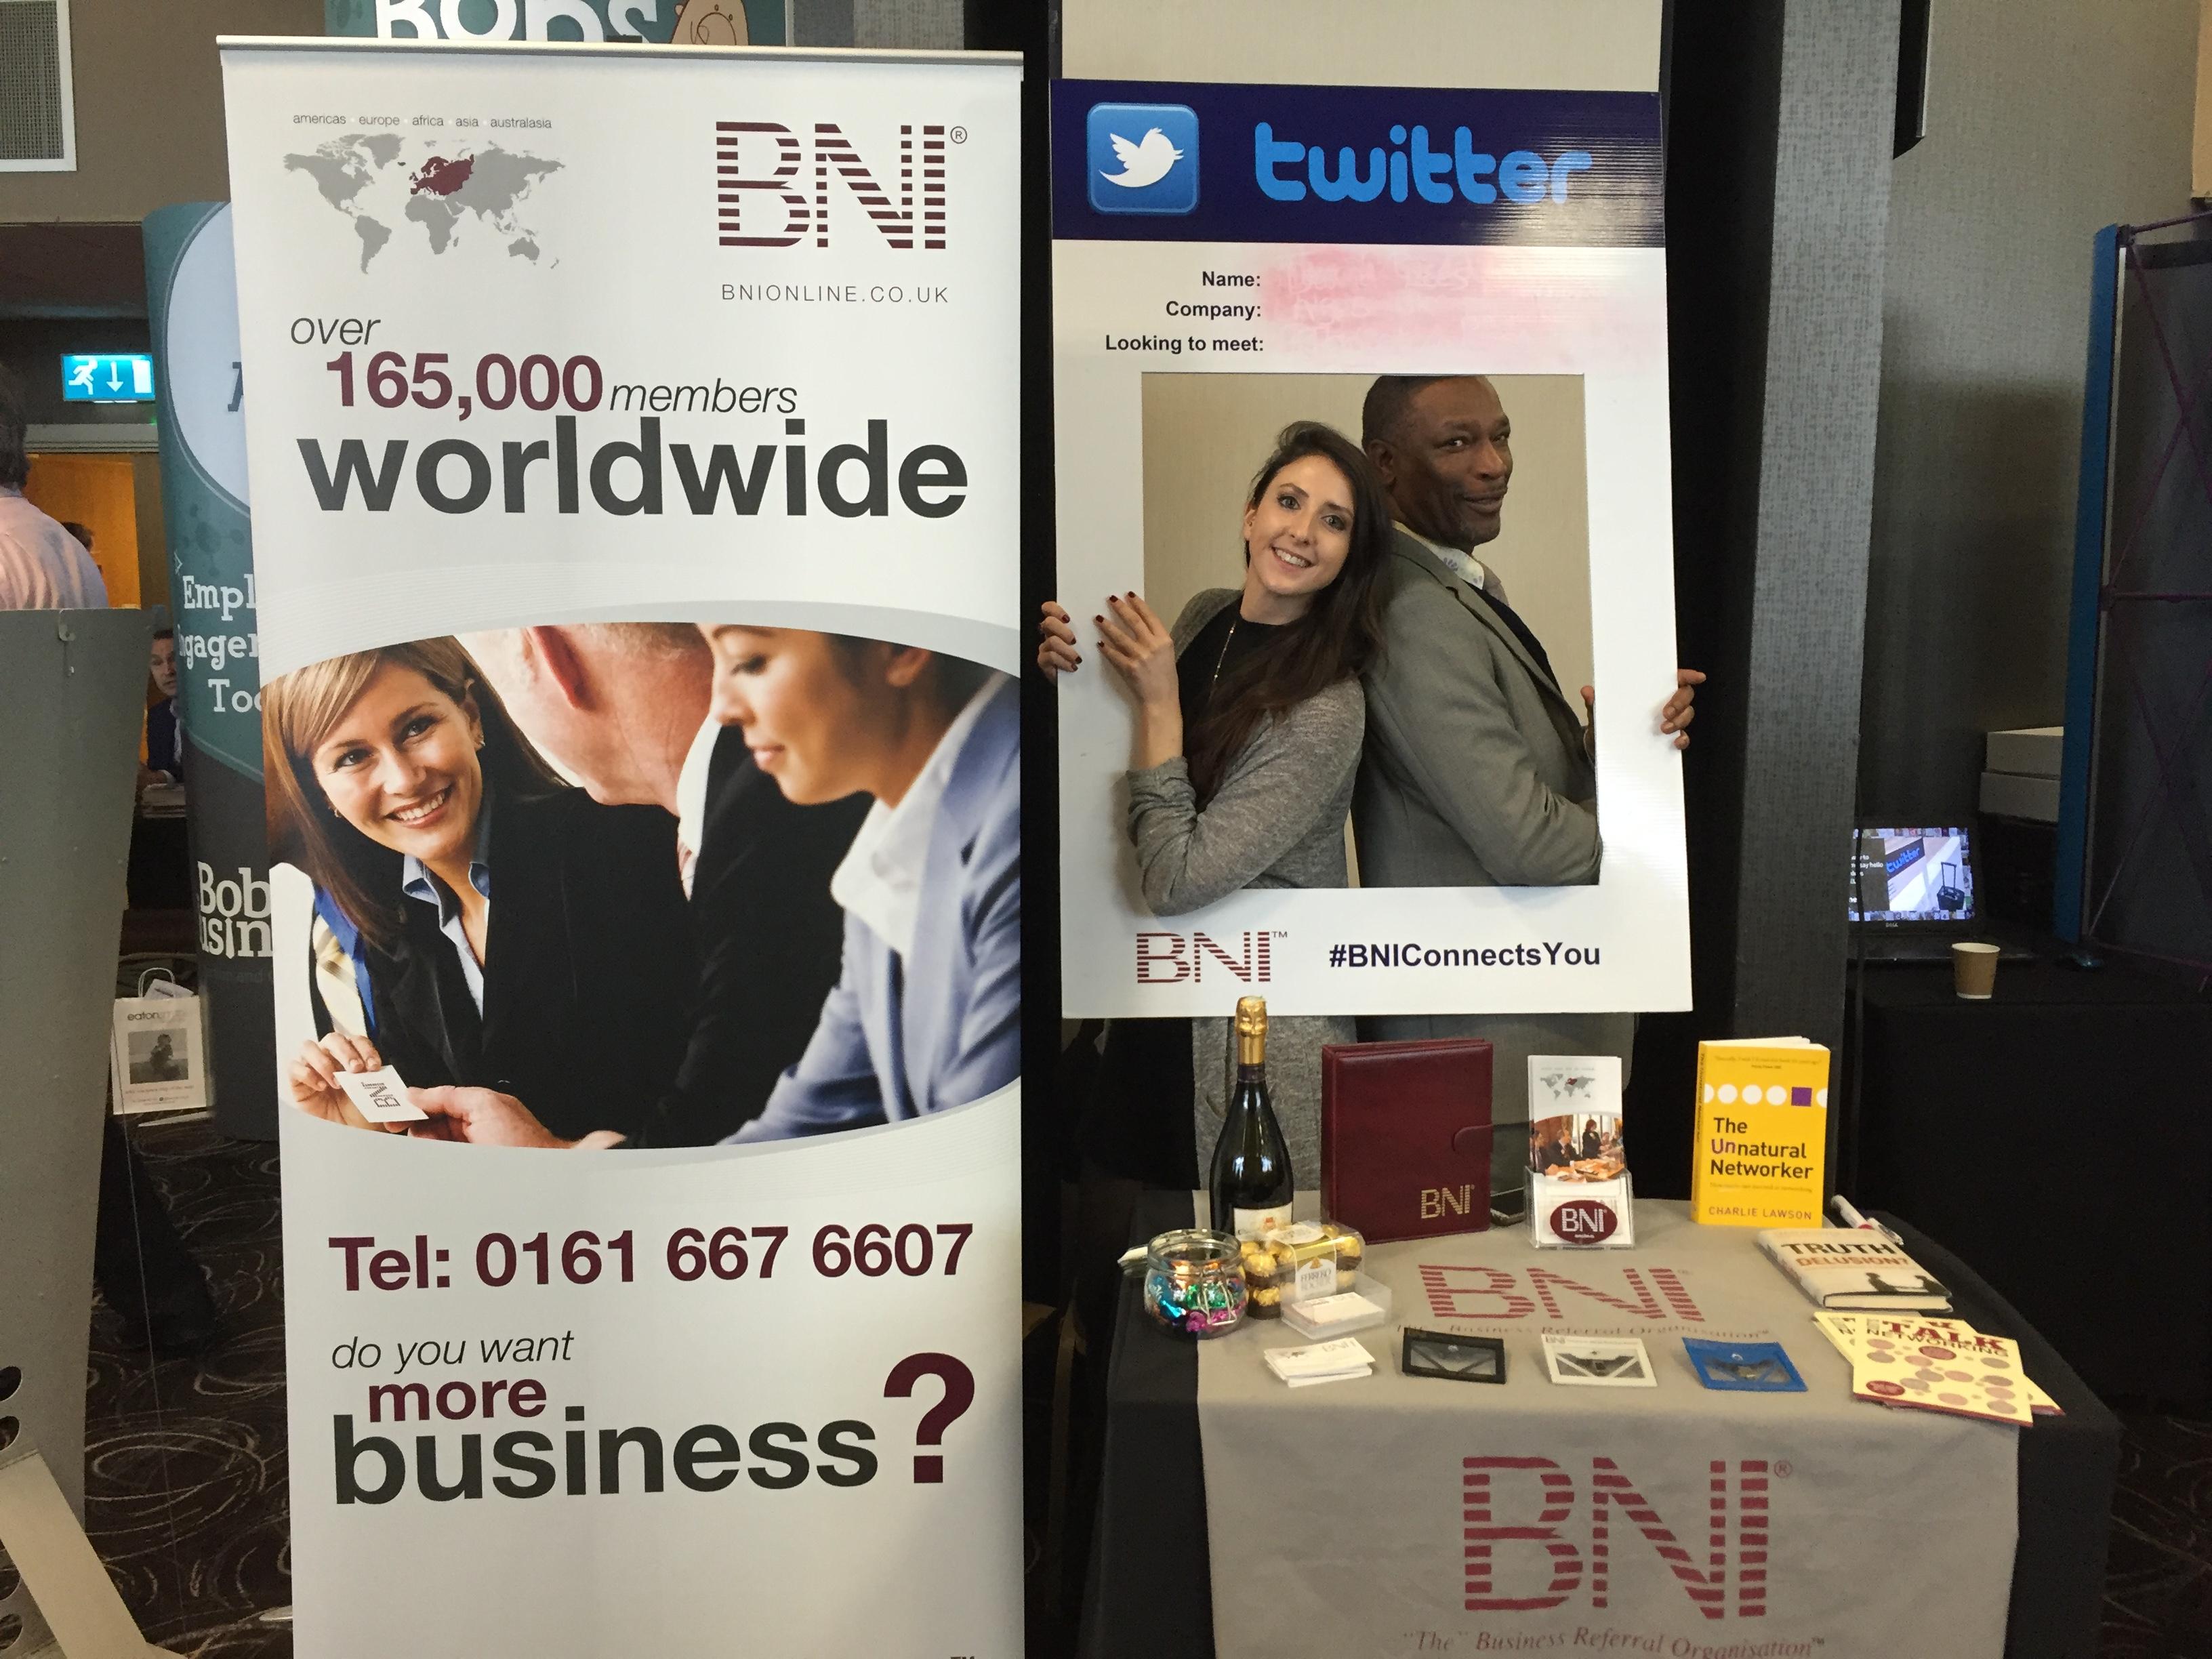 Social Progress Ltd - Kirklees Business Conference #MYCK16 - Mid Yorkshire Chamber of Commerce - BNI Global